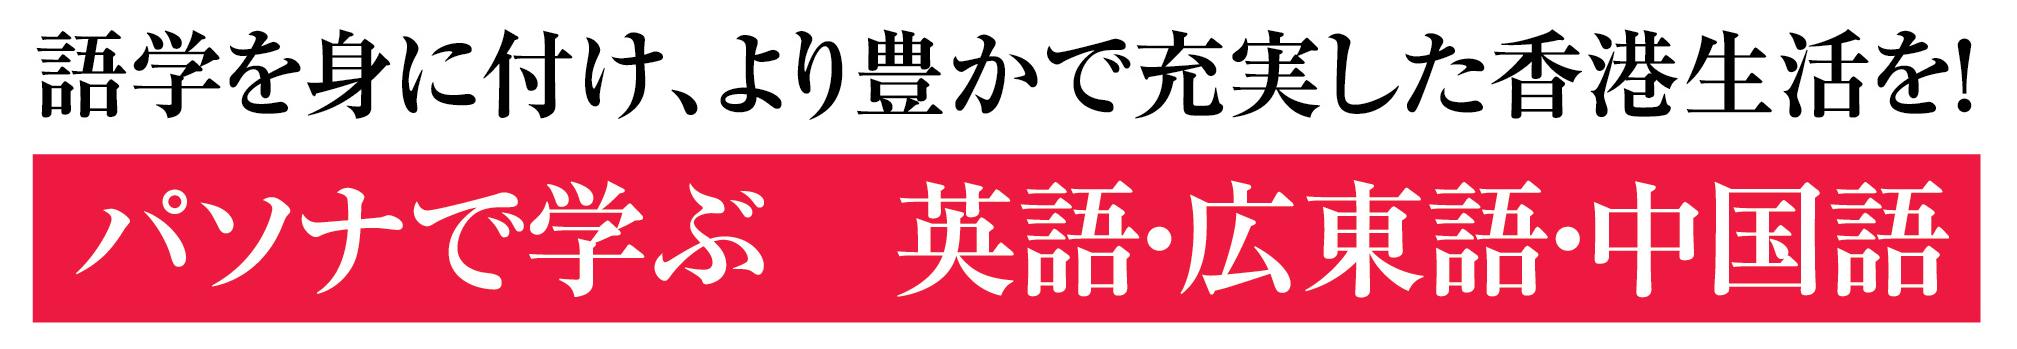 P07 School _PASONA Japanese_759